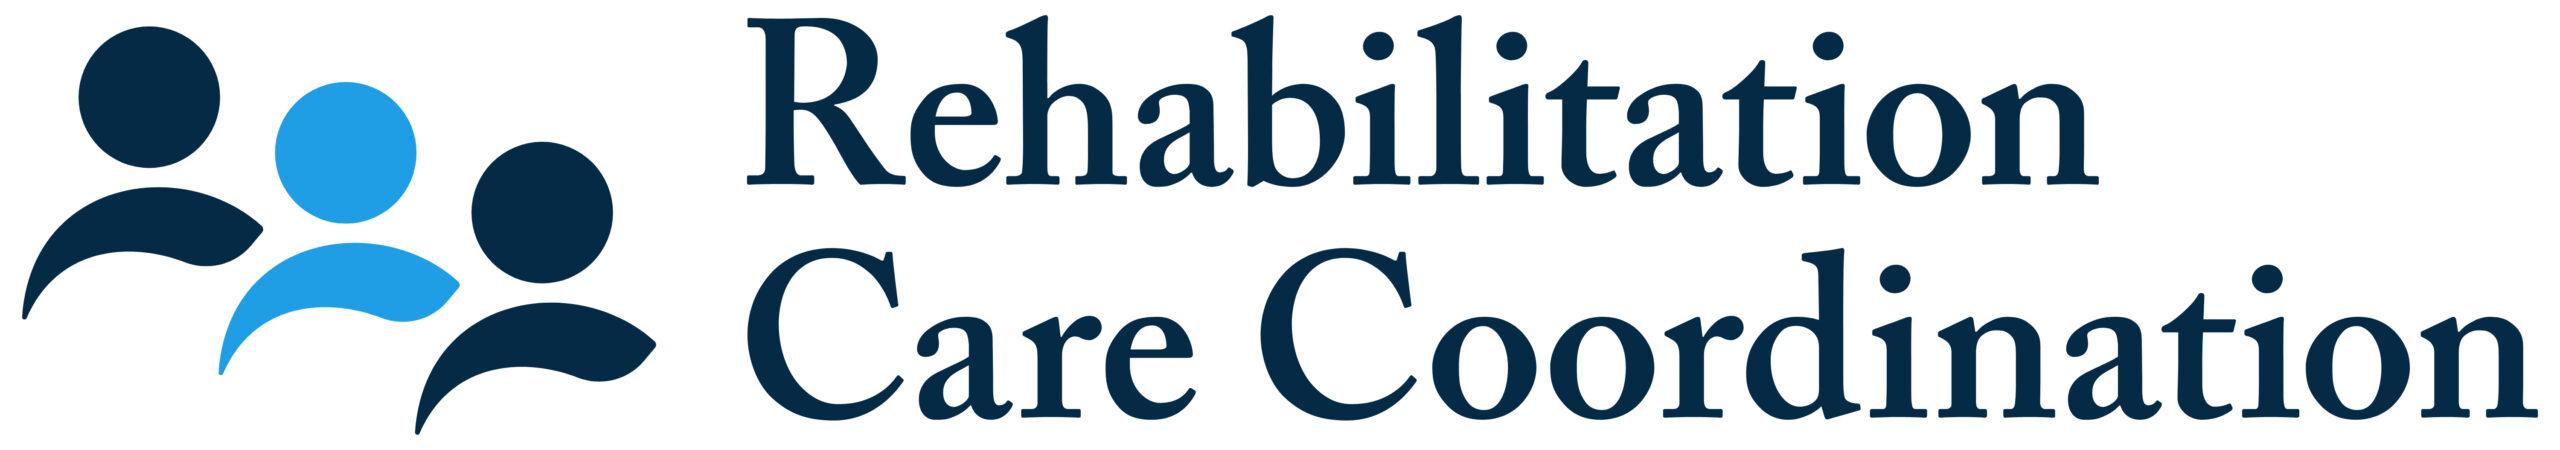 Rehabilitation Care Coordination